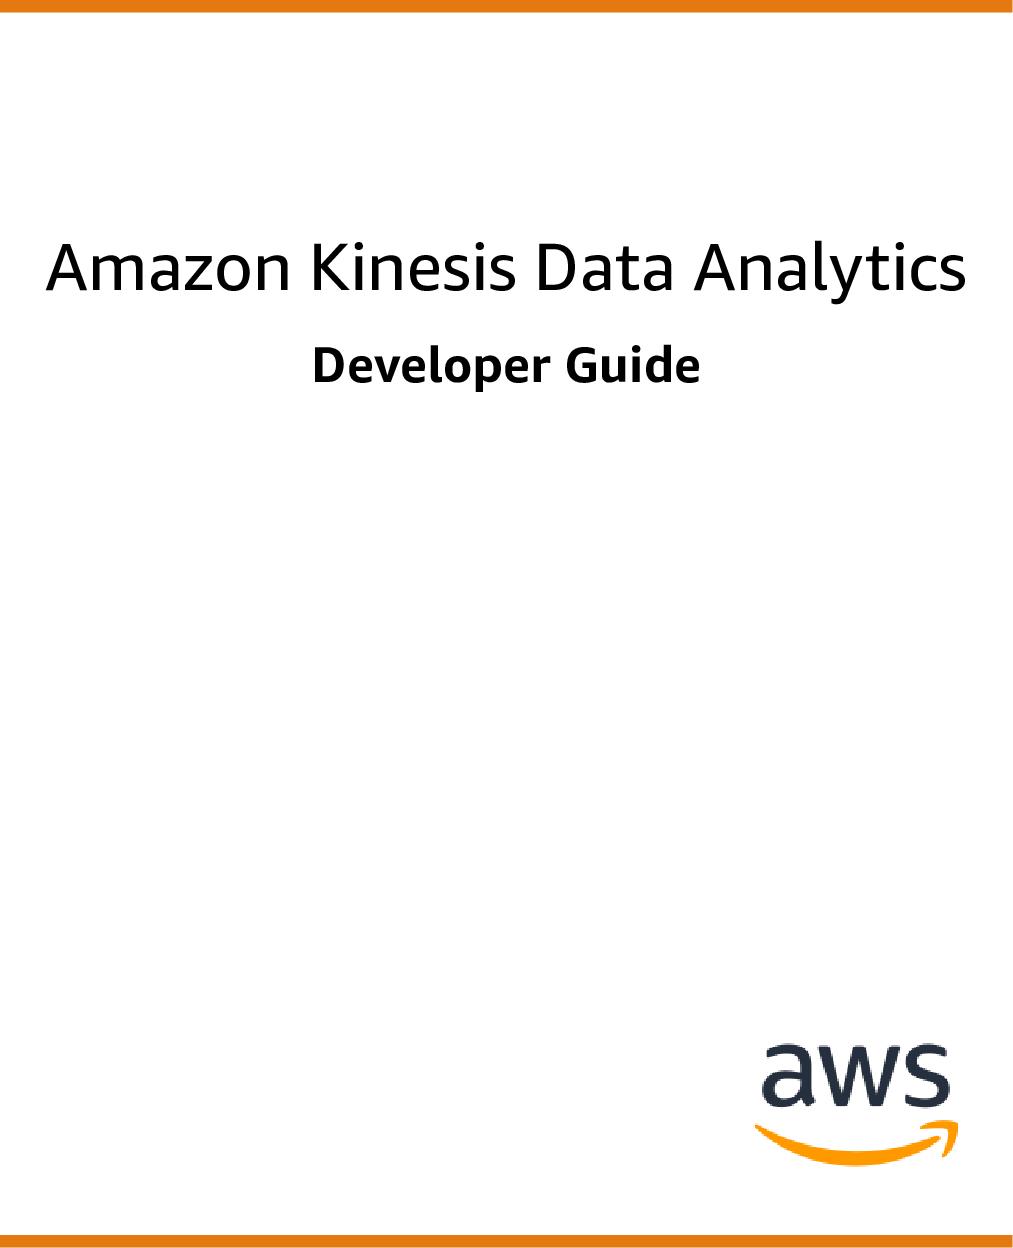 Amazon Kinesis Data Analytics Developer Guide 2 Dev